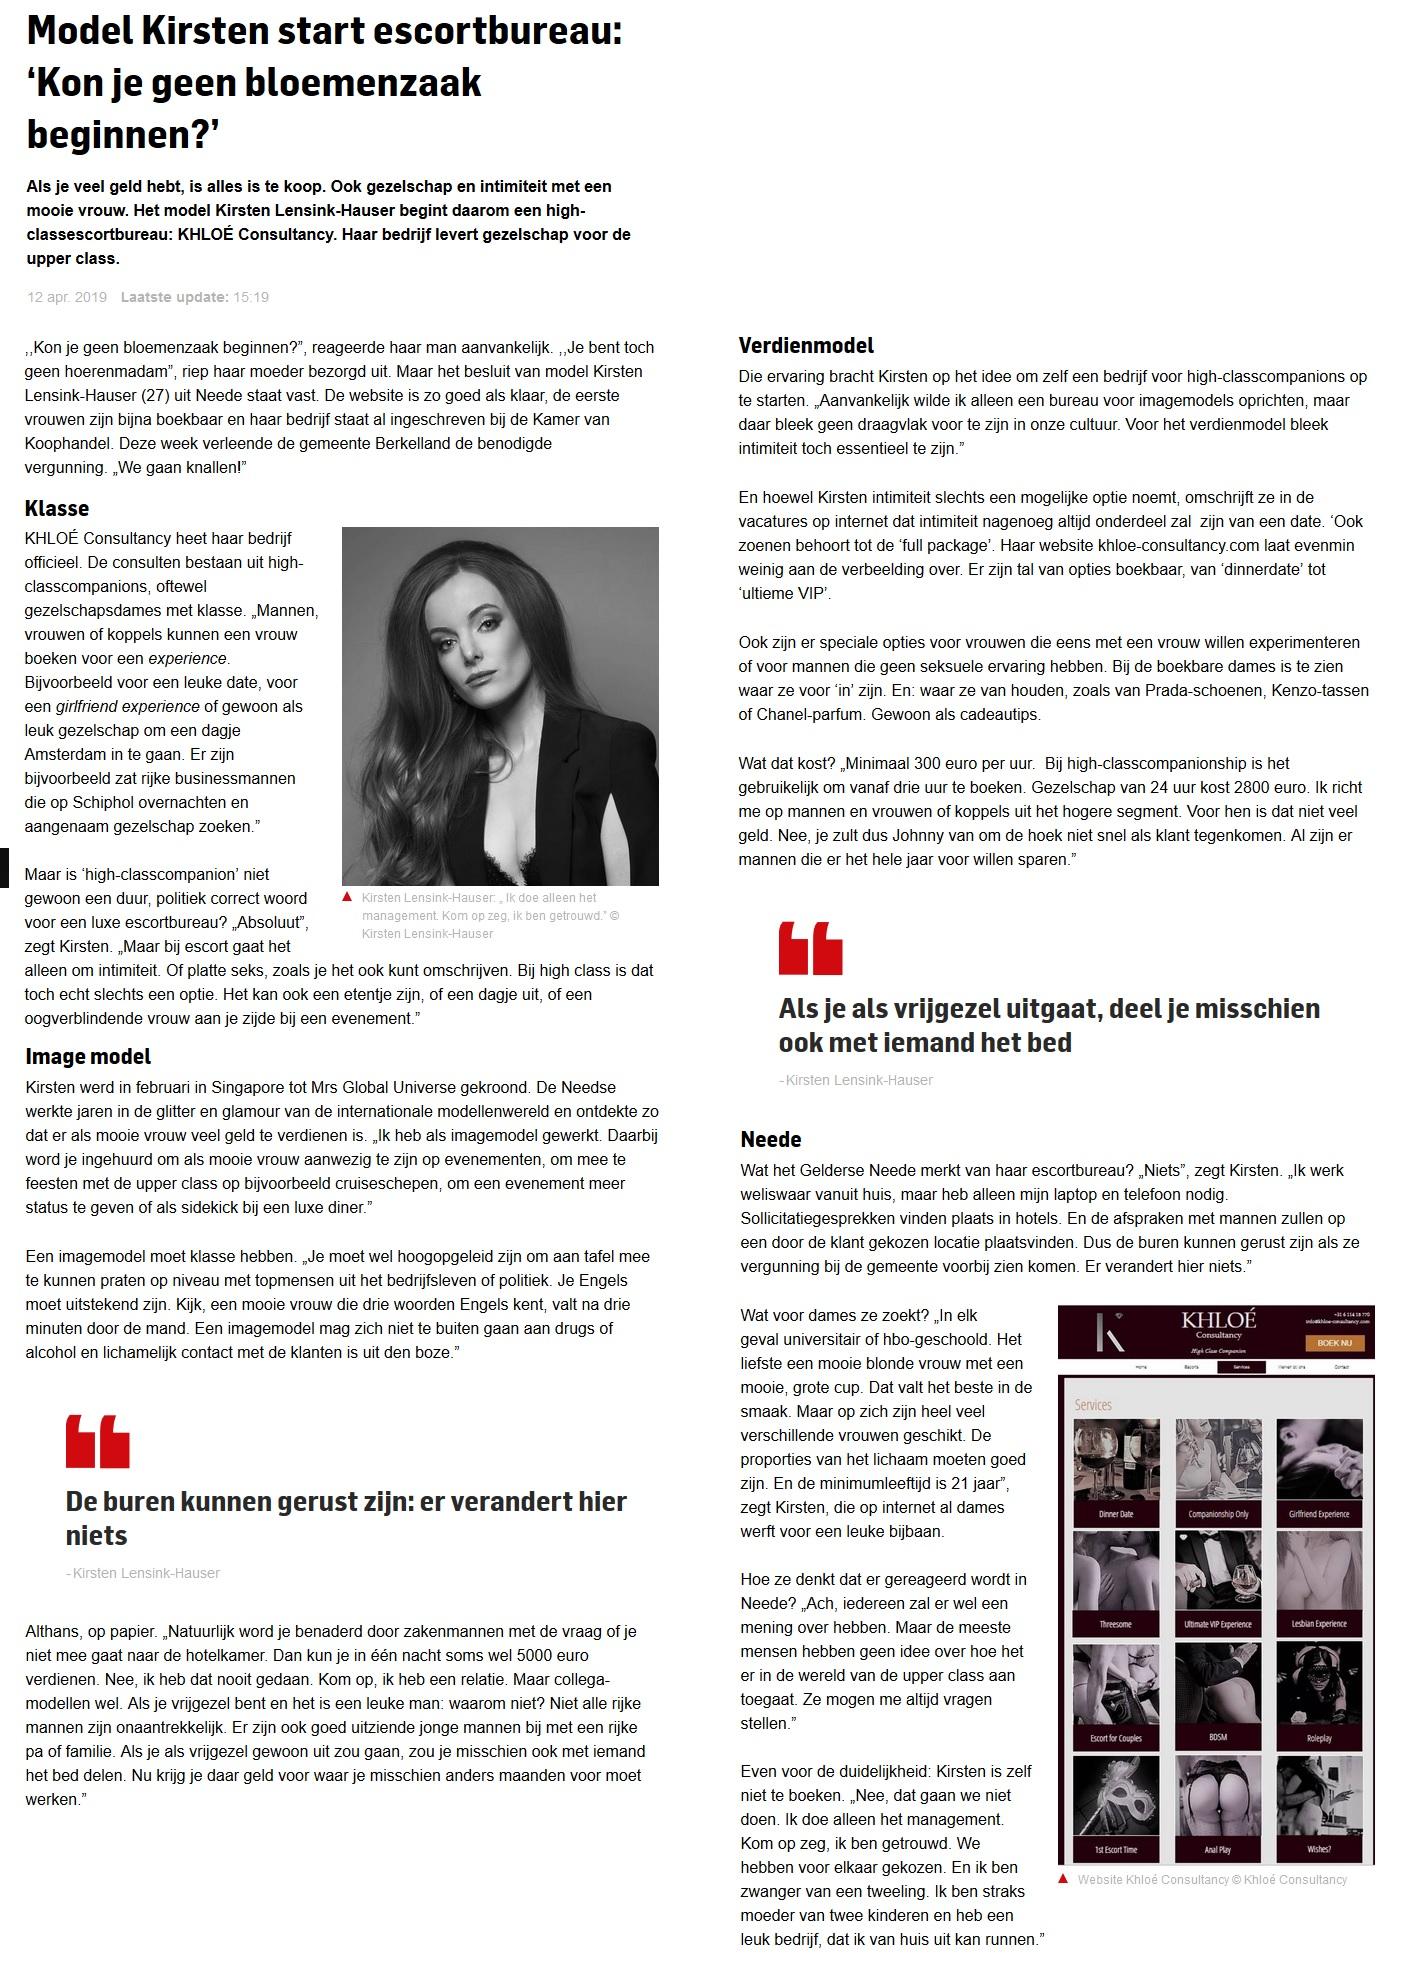 Artikel KHLOÉ Consultancy - Algemeen Dagblad